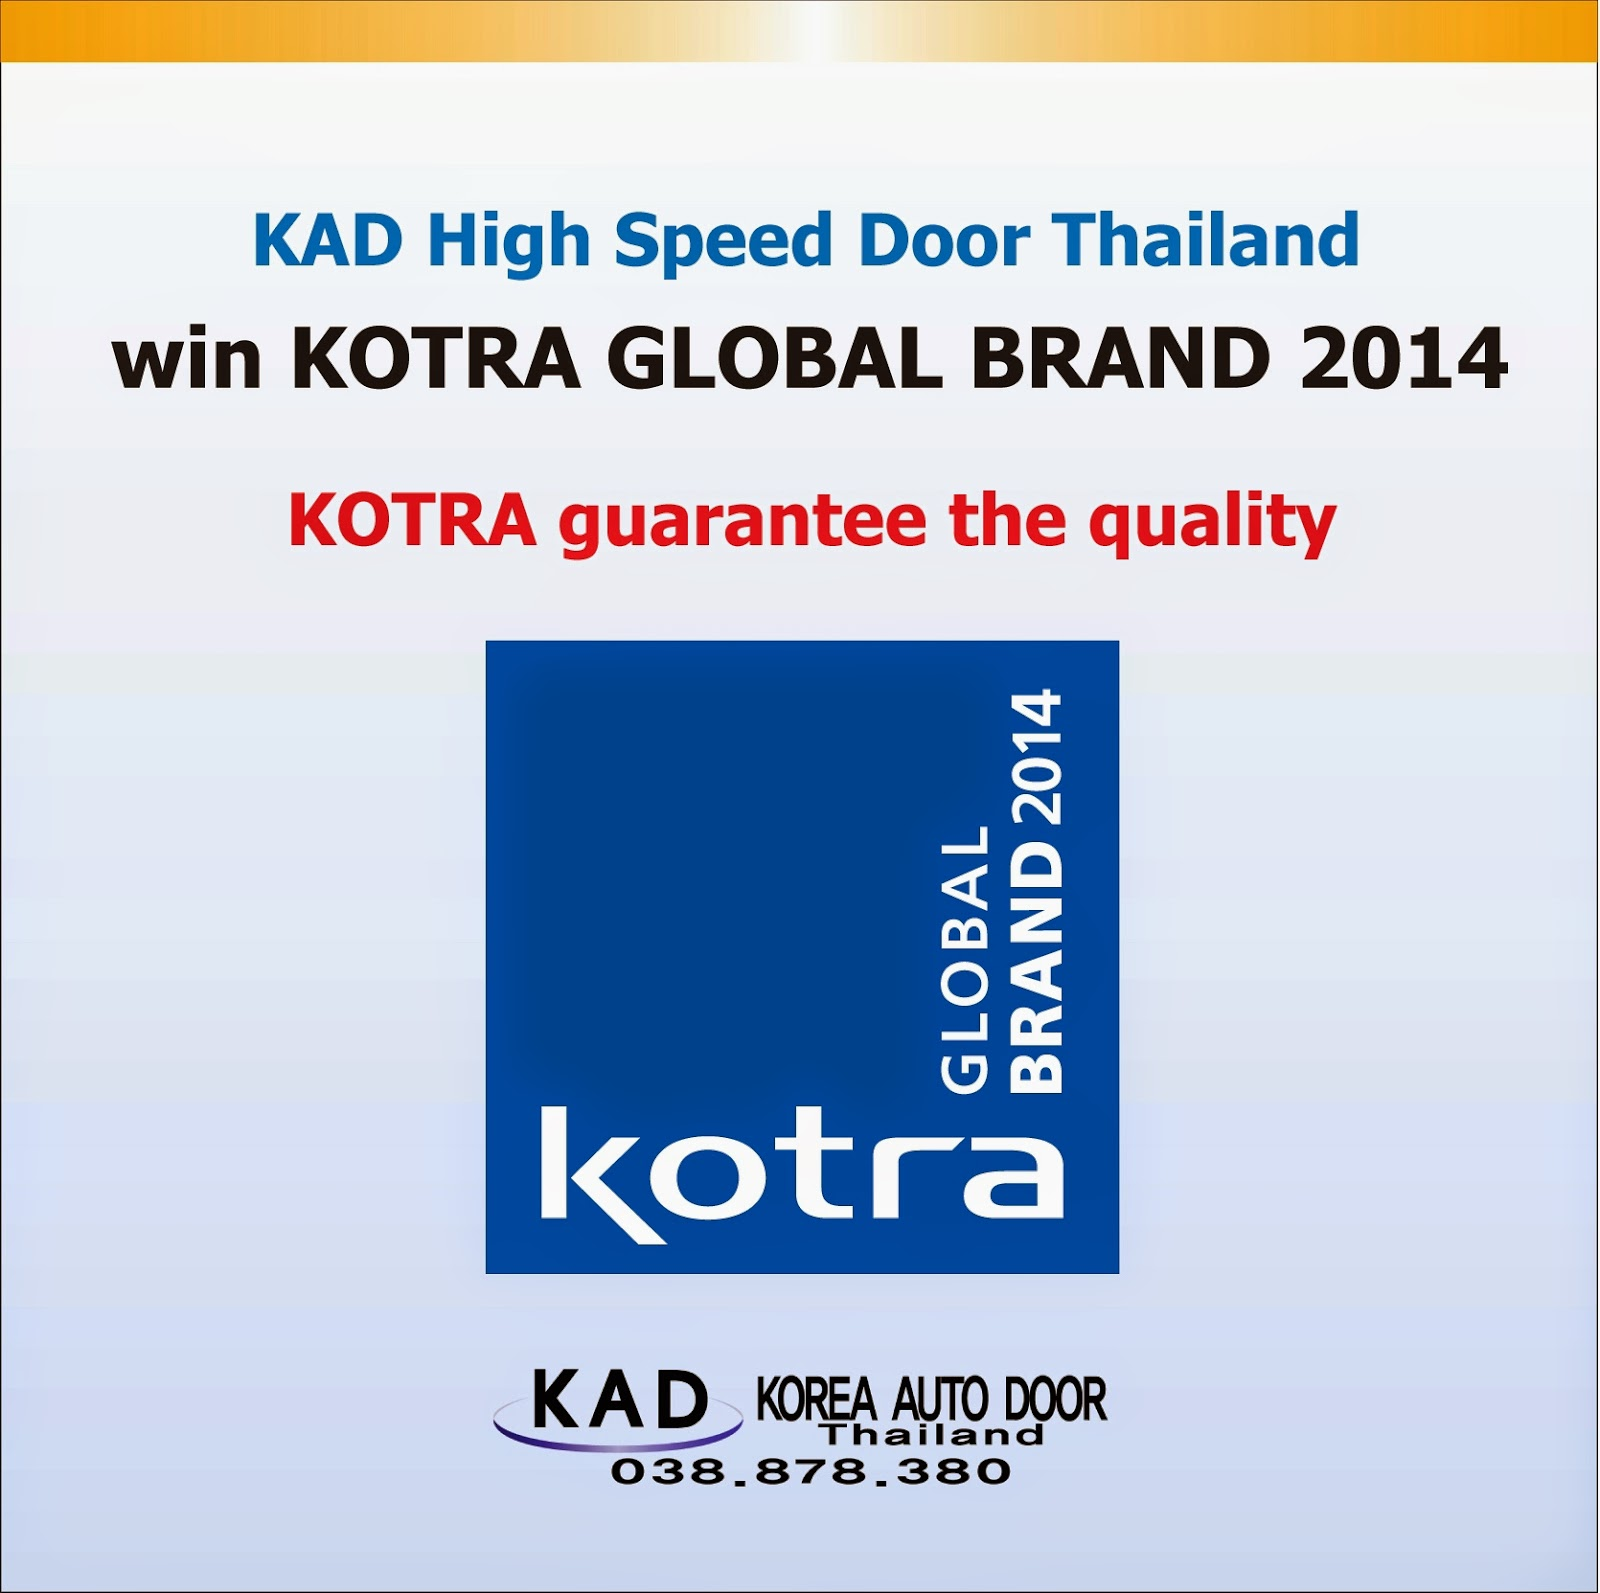 KAD high speed door awarded KOTRA global brand